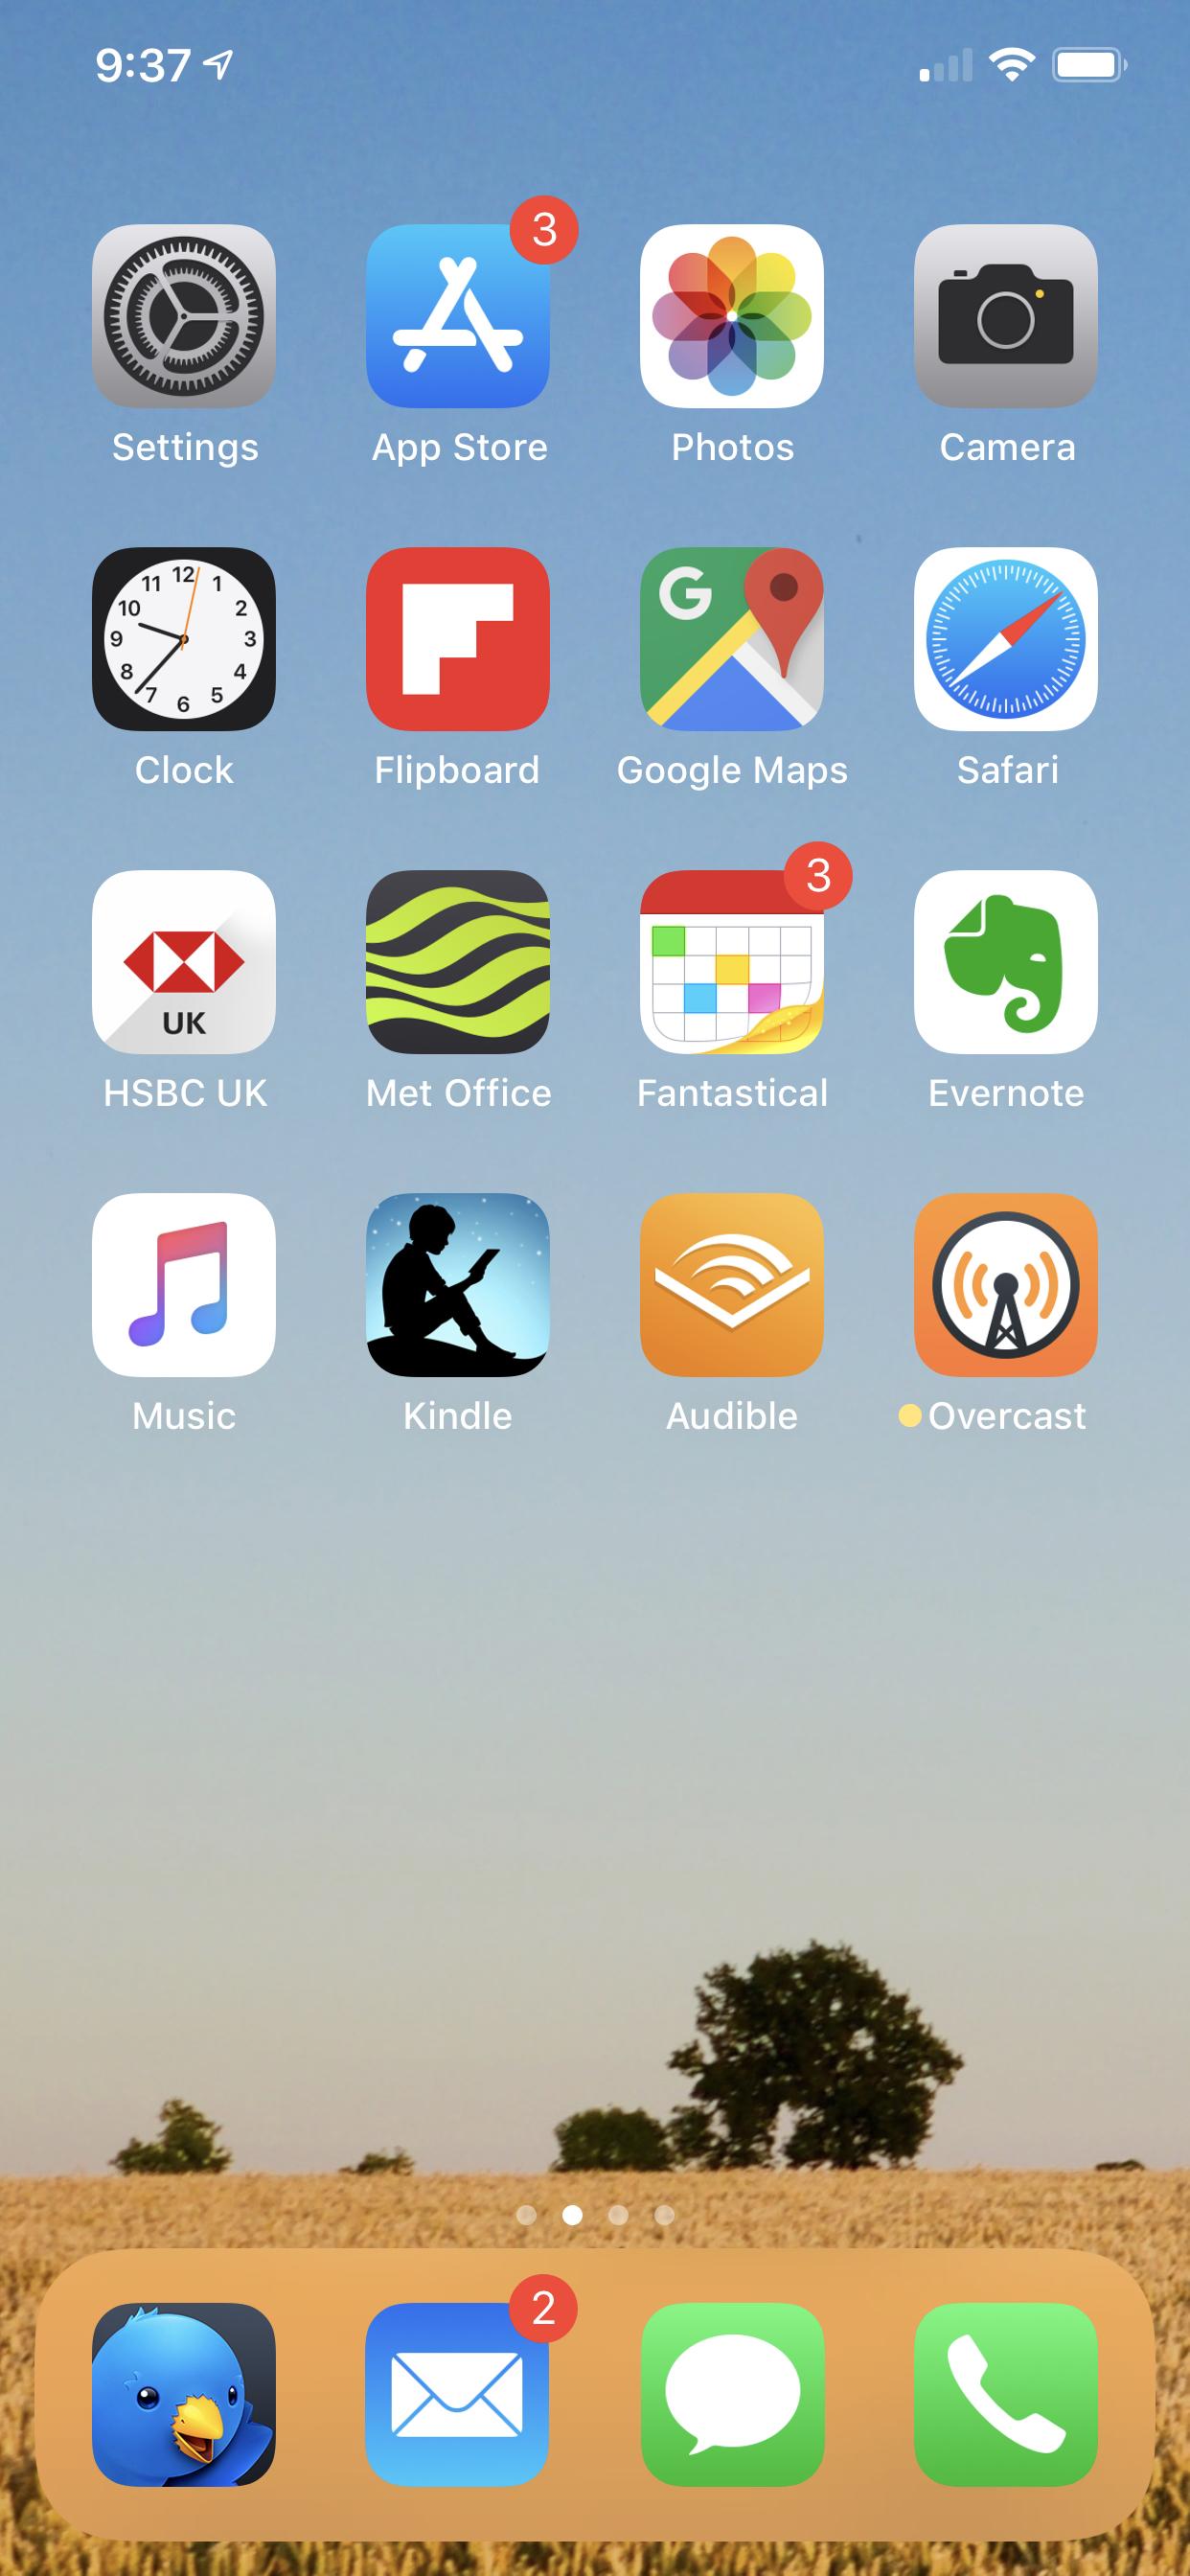 Kirk's iPhone home screen.